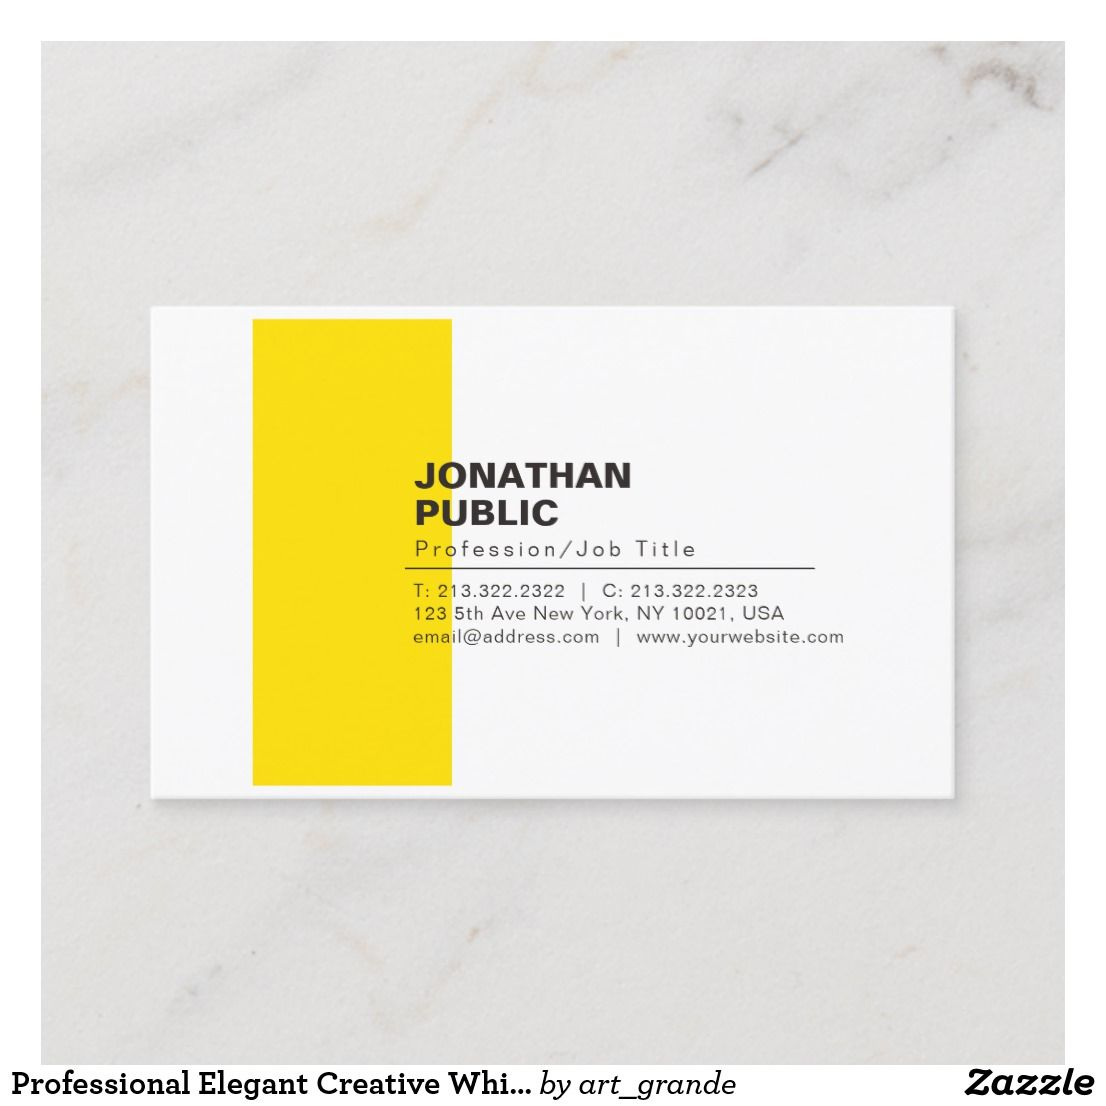 Professional Elegant Creative White Yellow Plain Business Card Zazzle Com Yellow White Elegant Creative